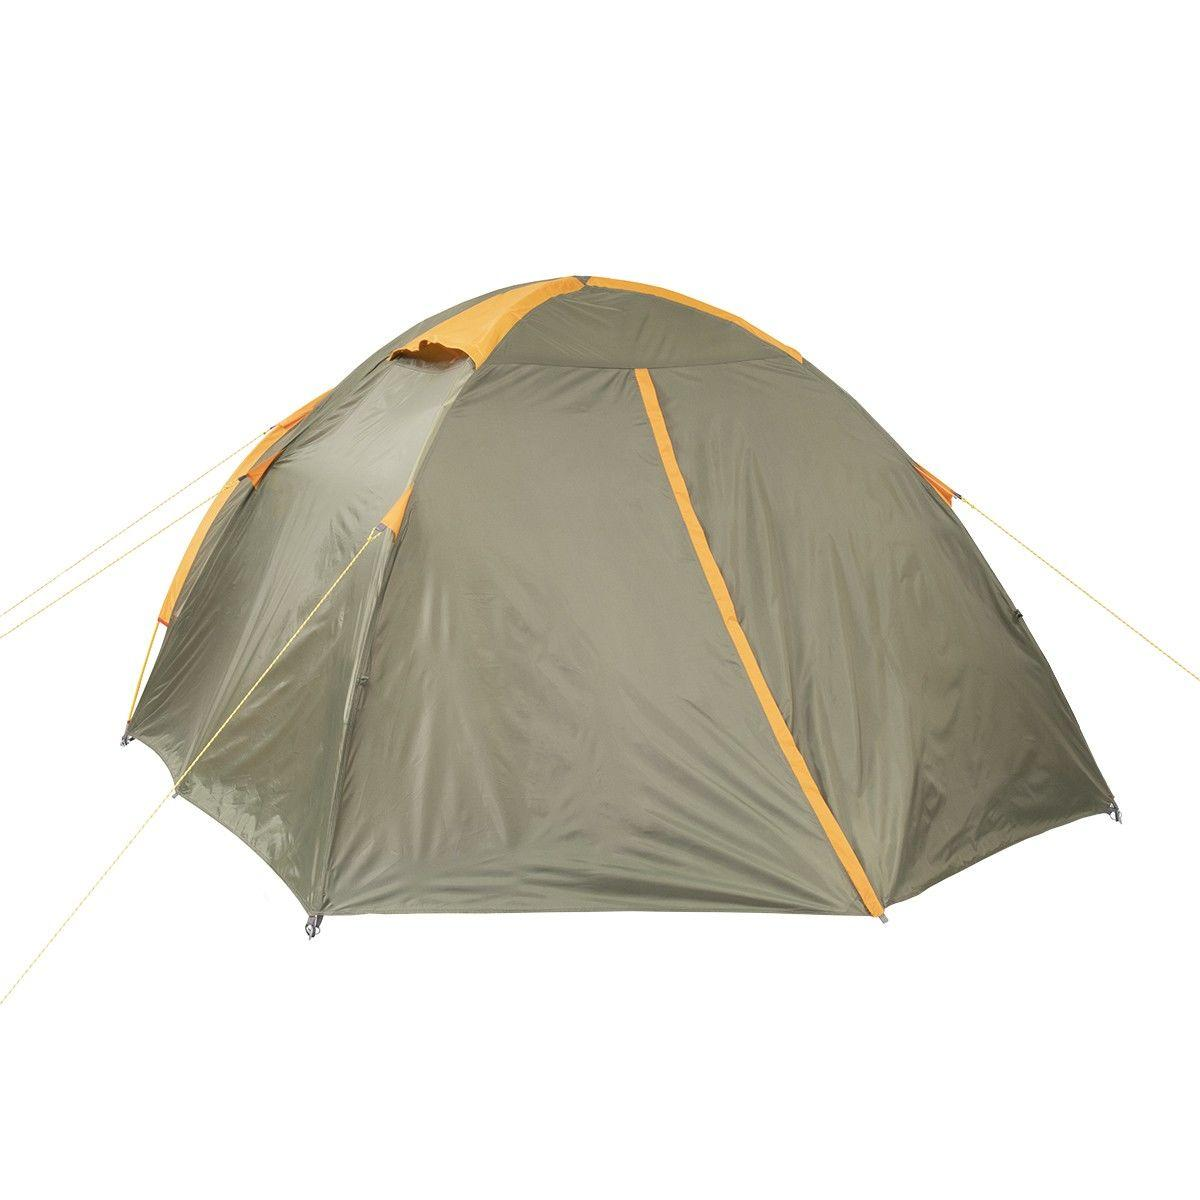 Палатка MUSSON-4 Helios зеленый-оранжевый HS-2366-4 GO - фото 2